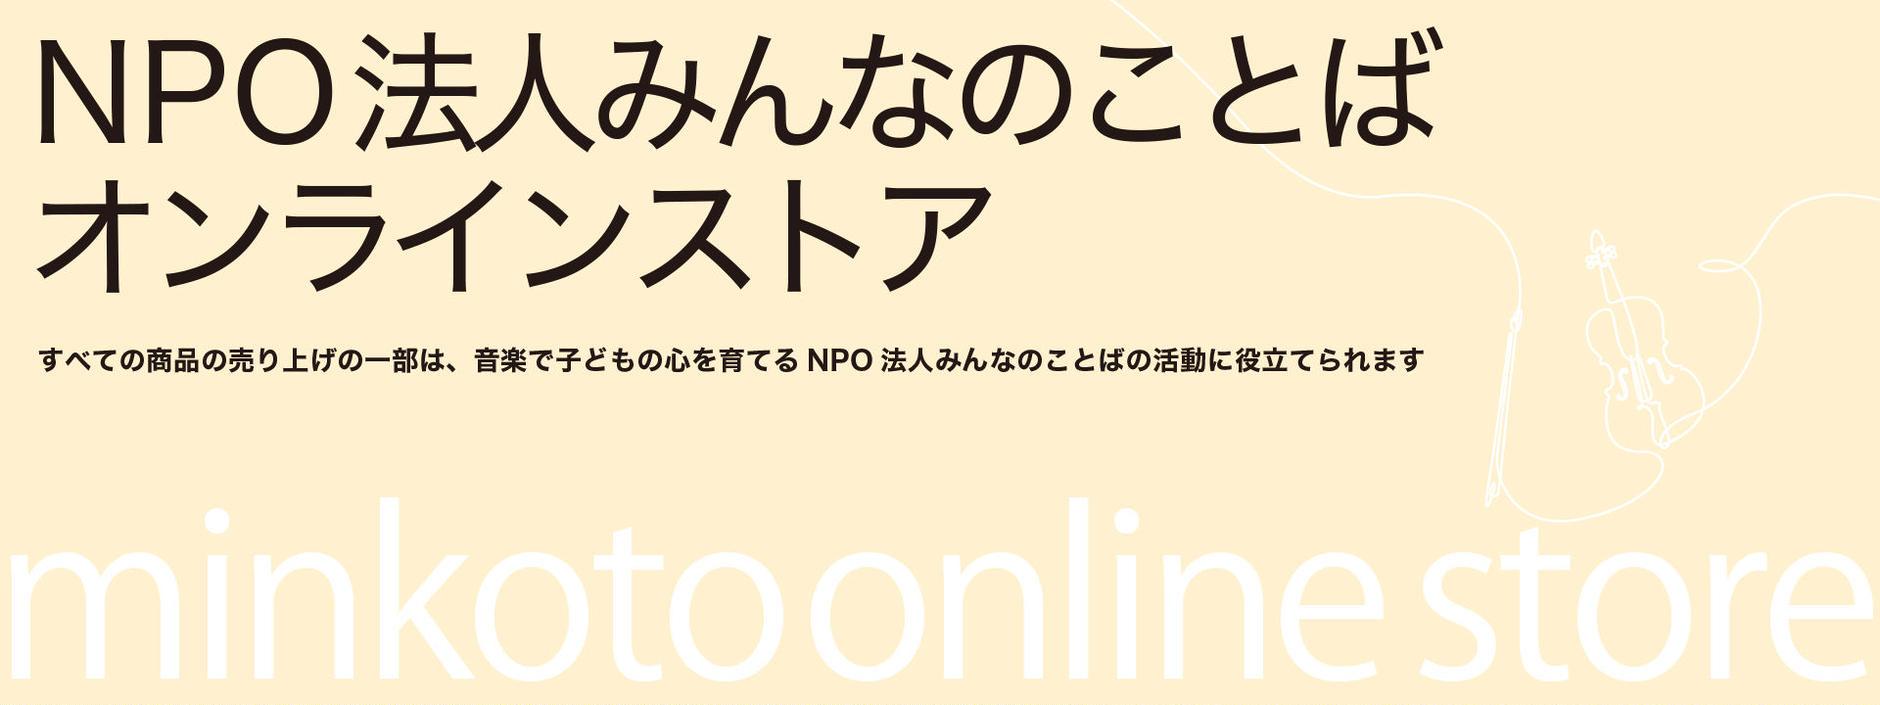 minkoto online store|NPO法人みんなのことばオンラインストア